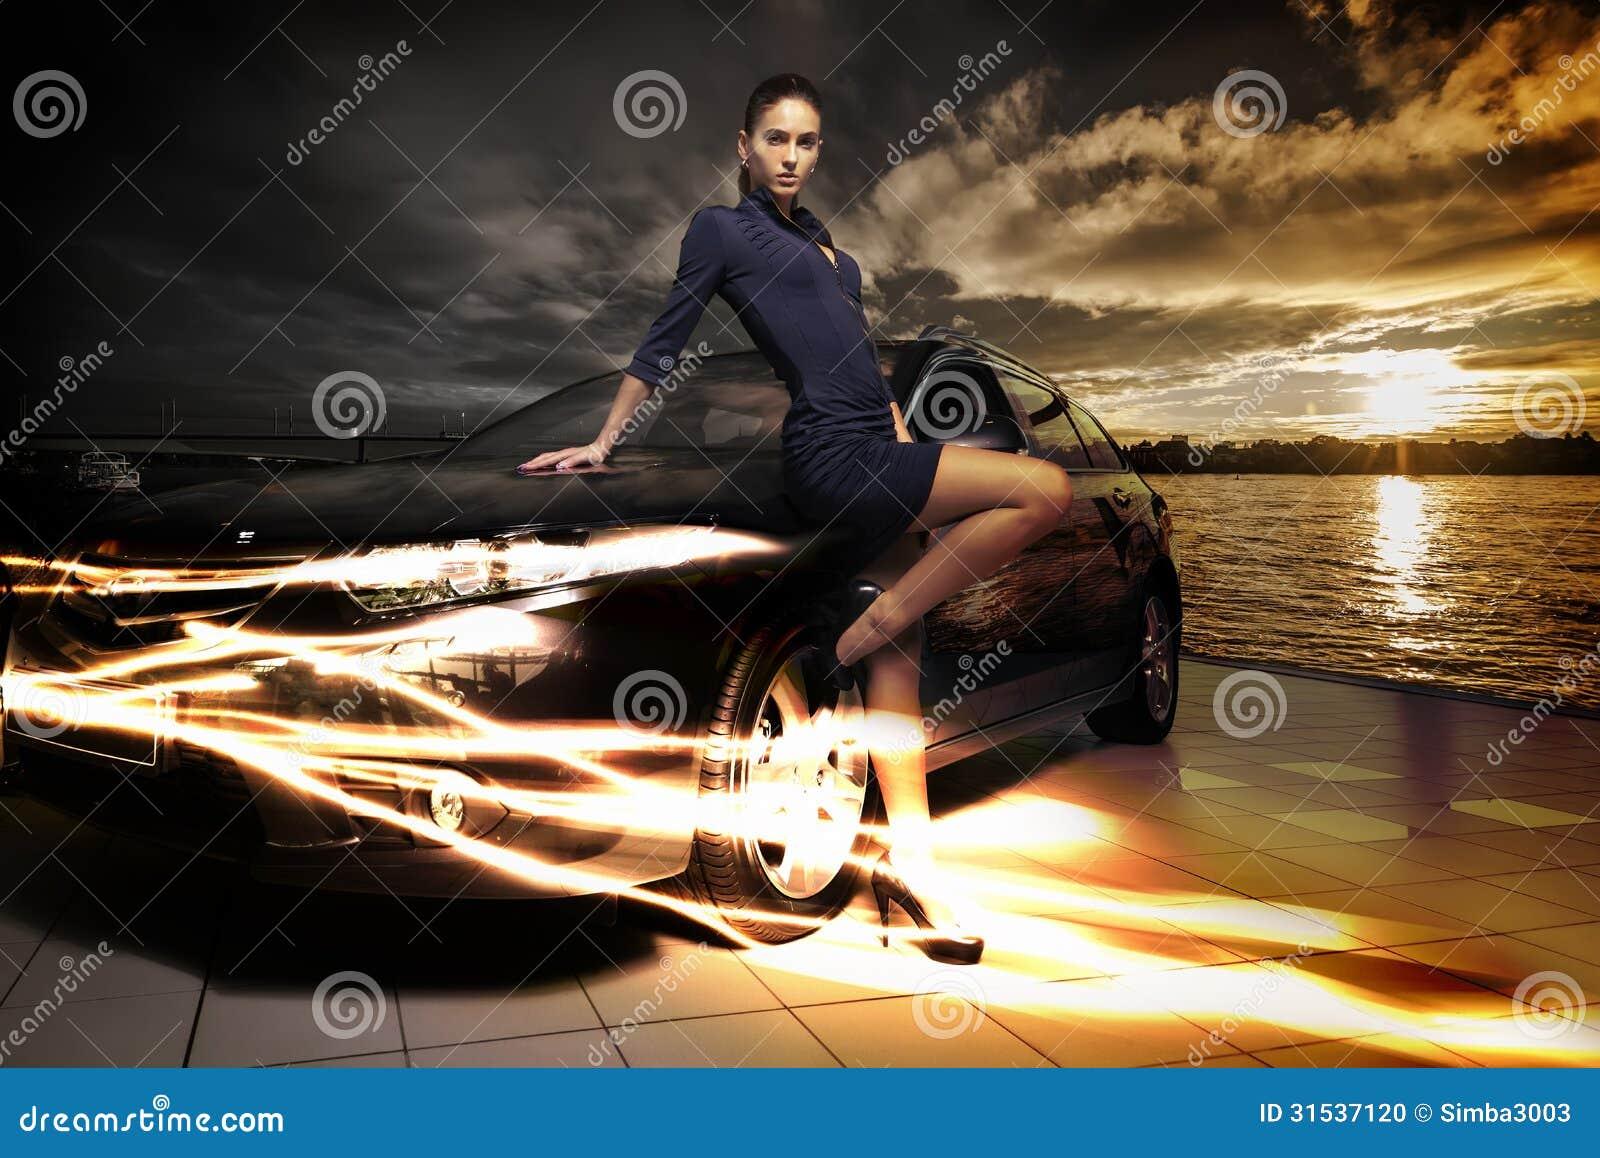 Mulher surpreendente que levanta ao lado de seu carro, fundo fantástico da beleza da paisagem